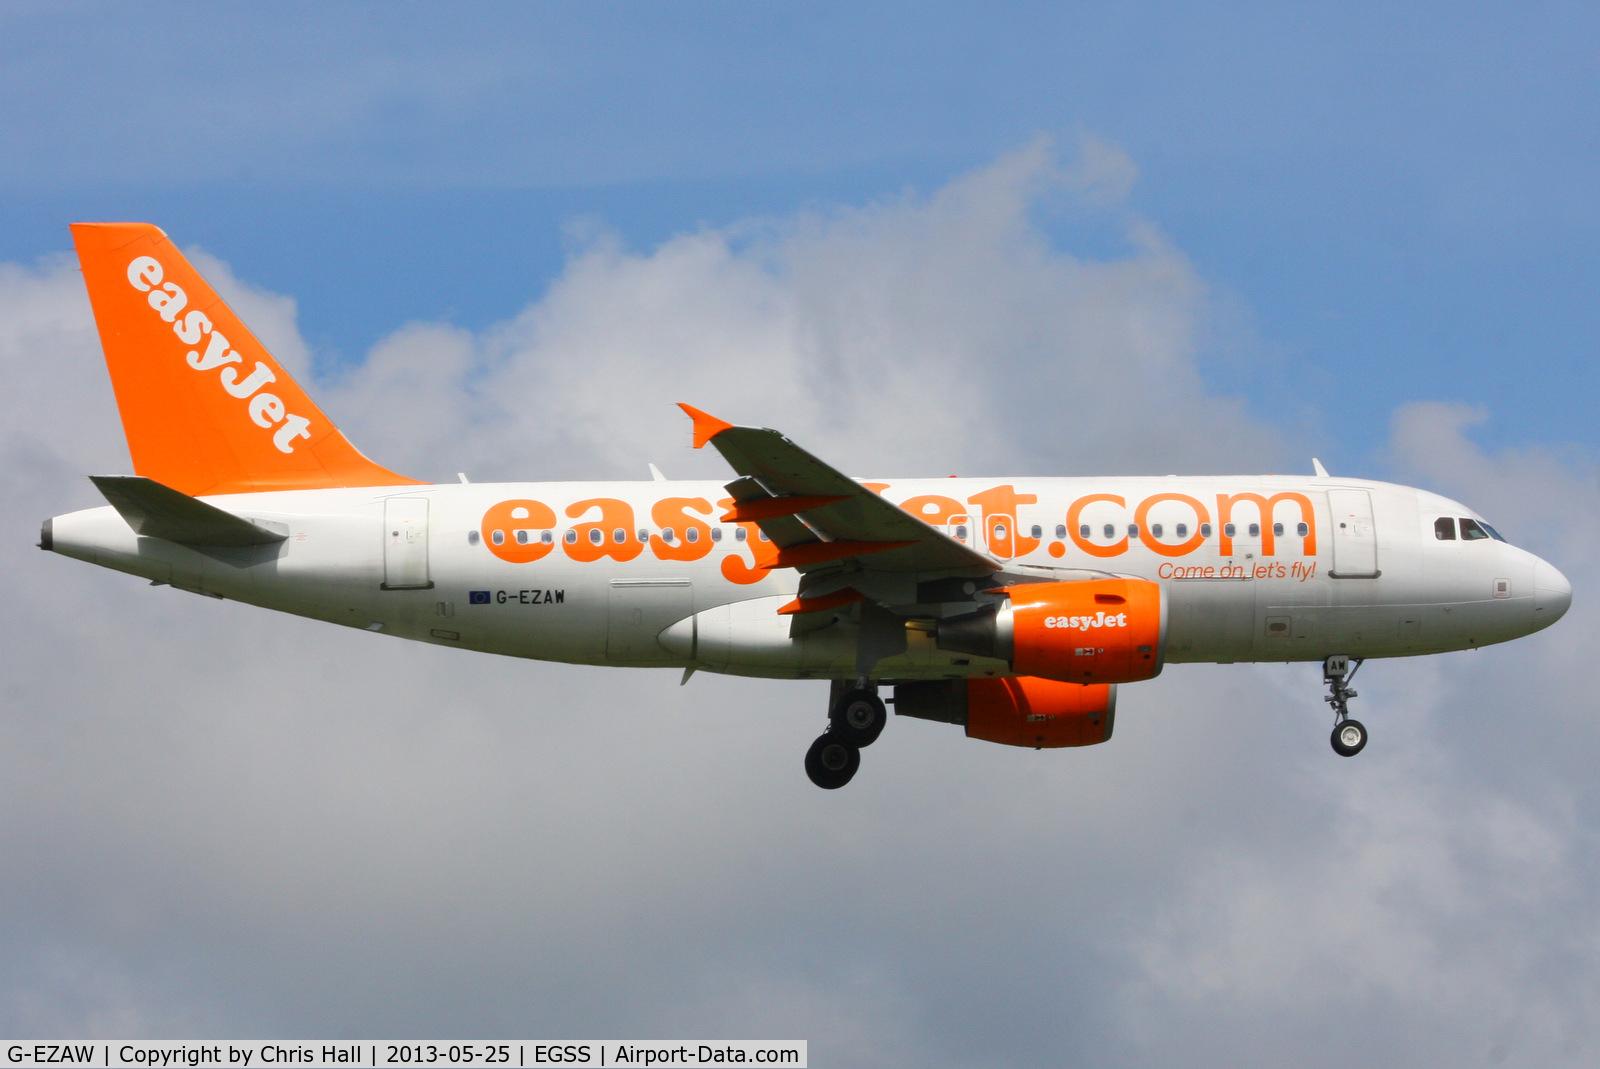 G-EZAW, 2006 Airbus A319-111 C/N 2812, easyJet